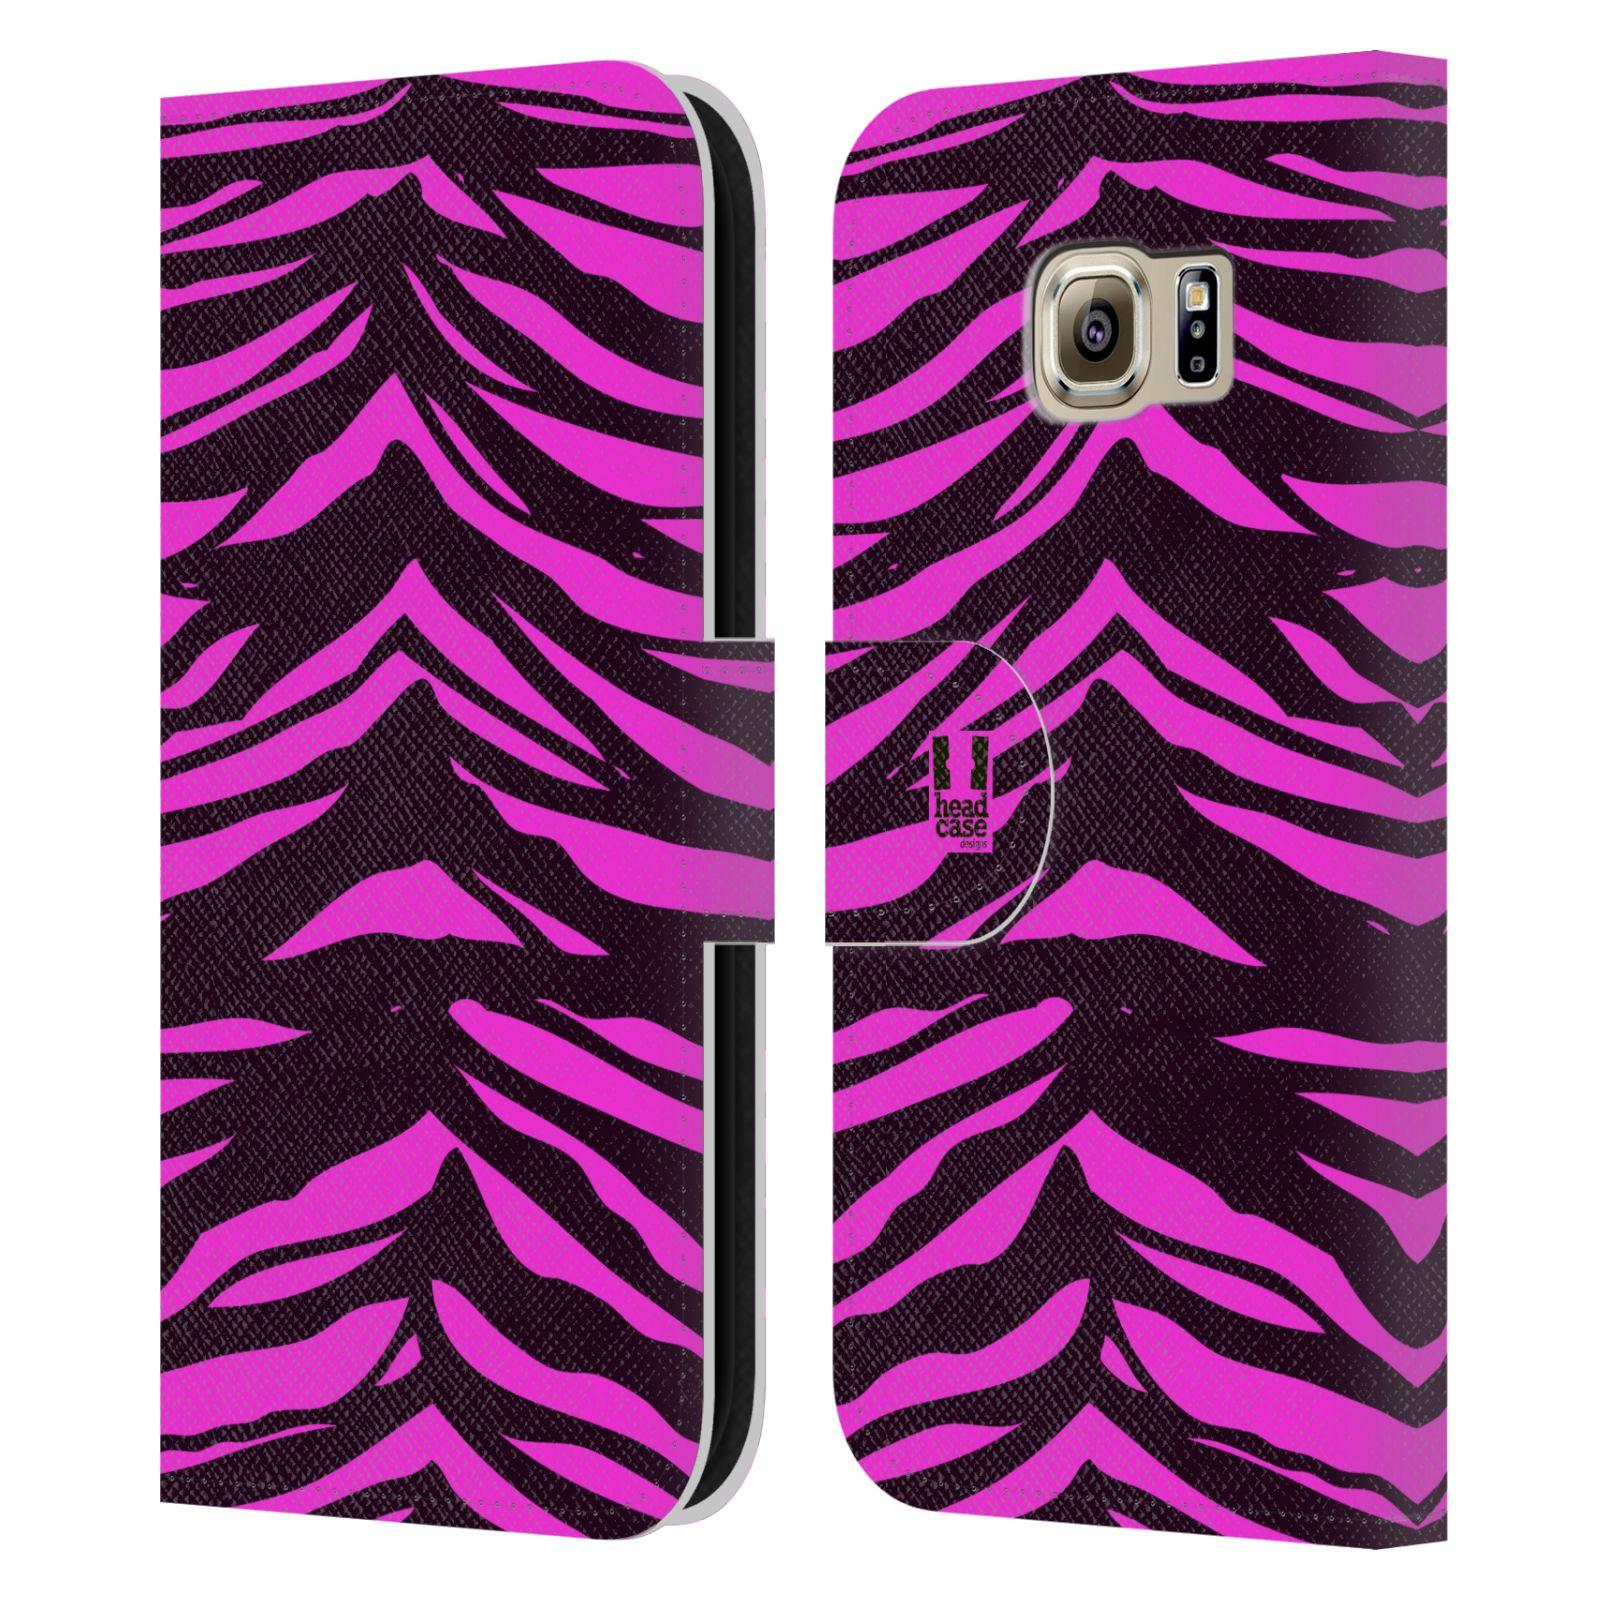 HEAD CASE Flipové pouzdro pro mobil Samsung Galaxy S6 (G9200) Zvířecí barevné vzory fialová tygr